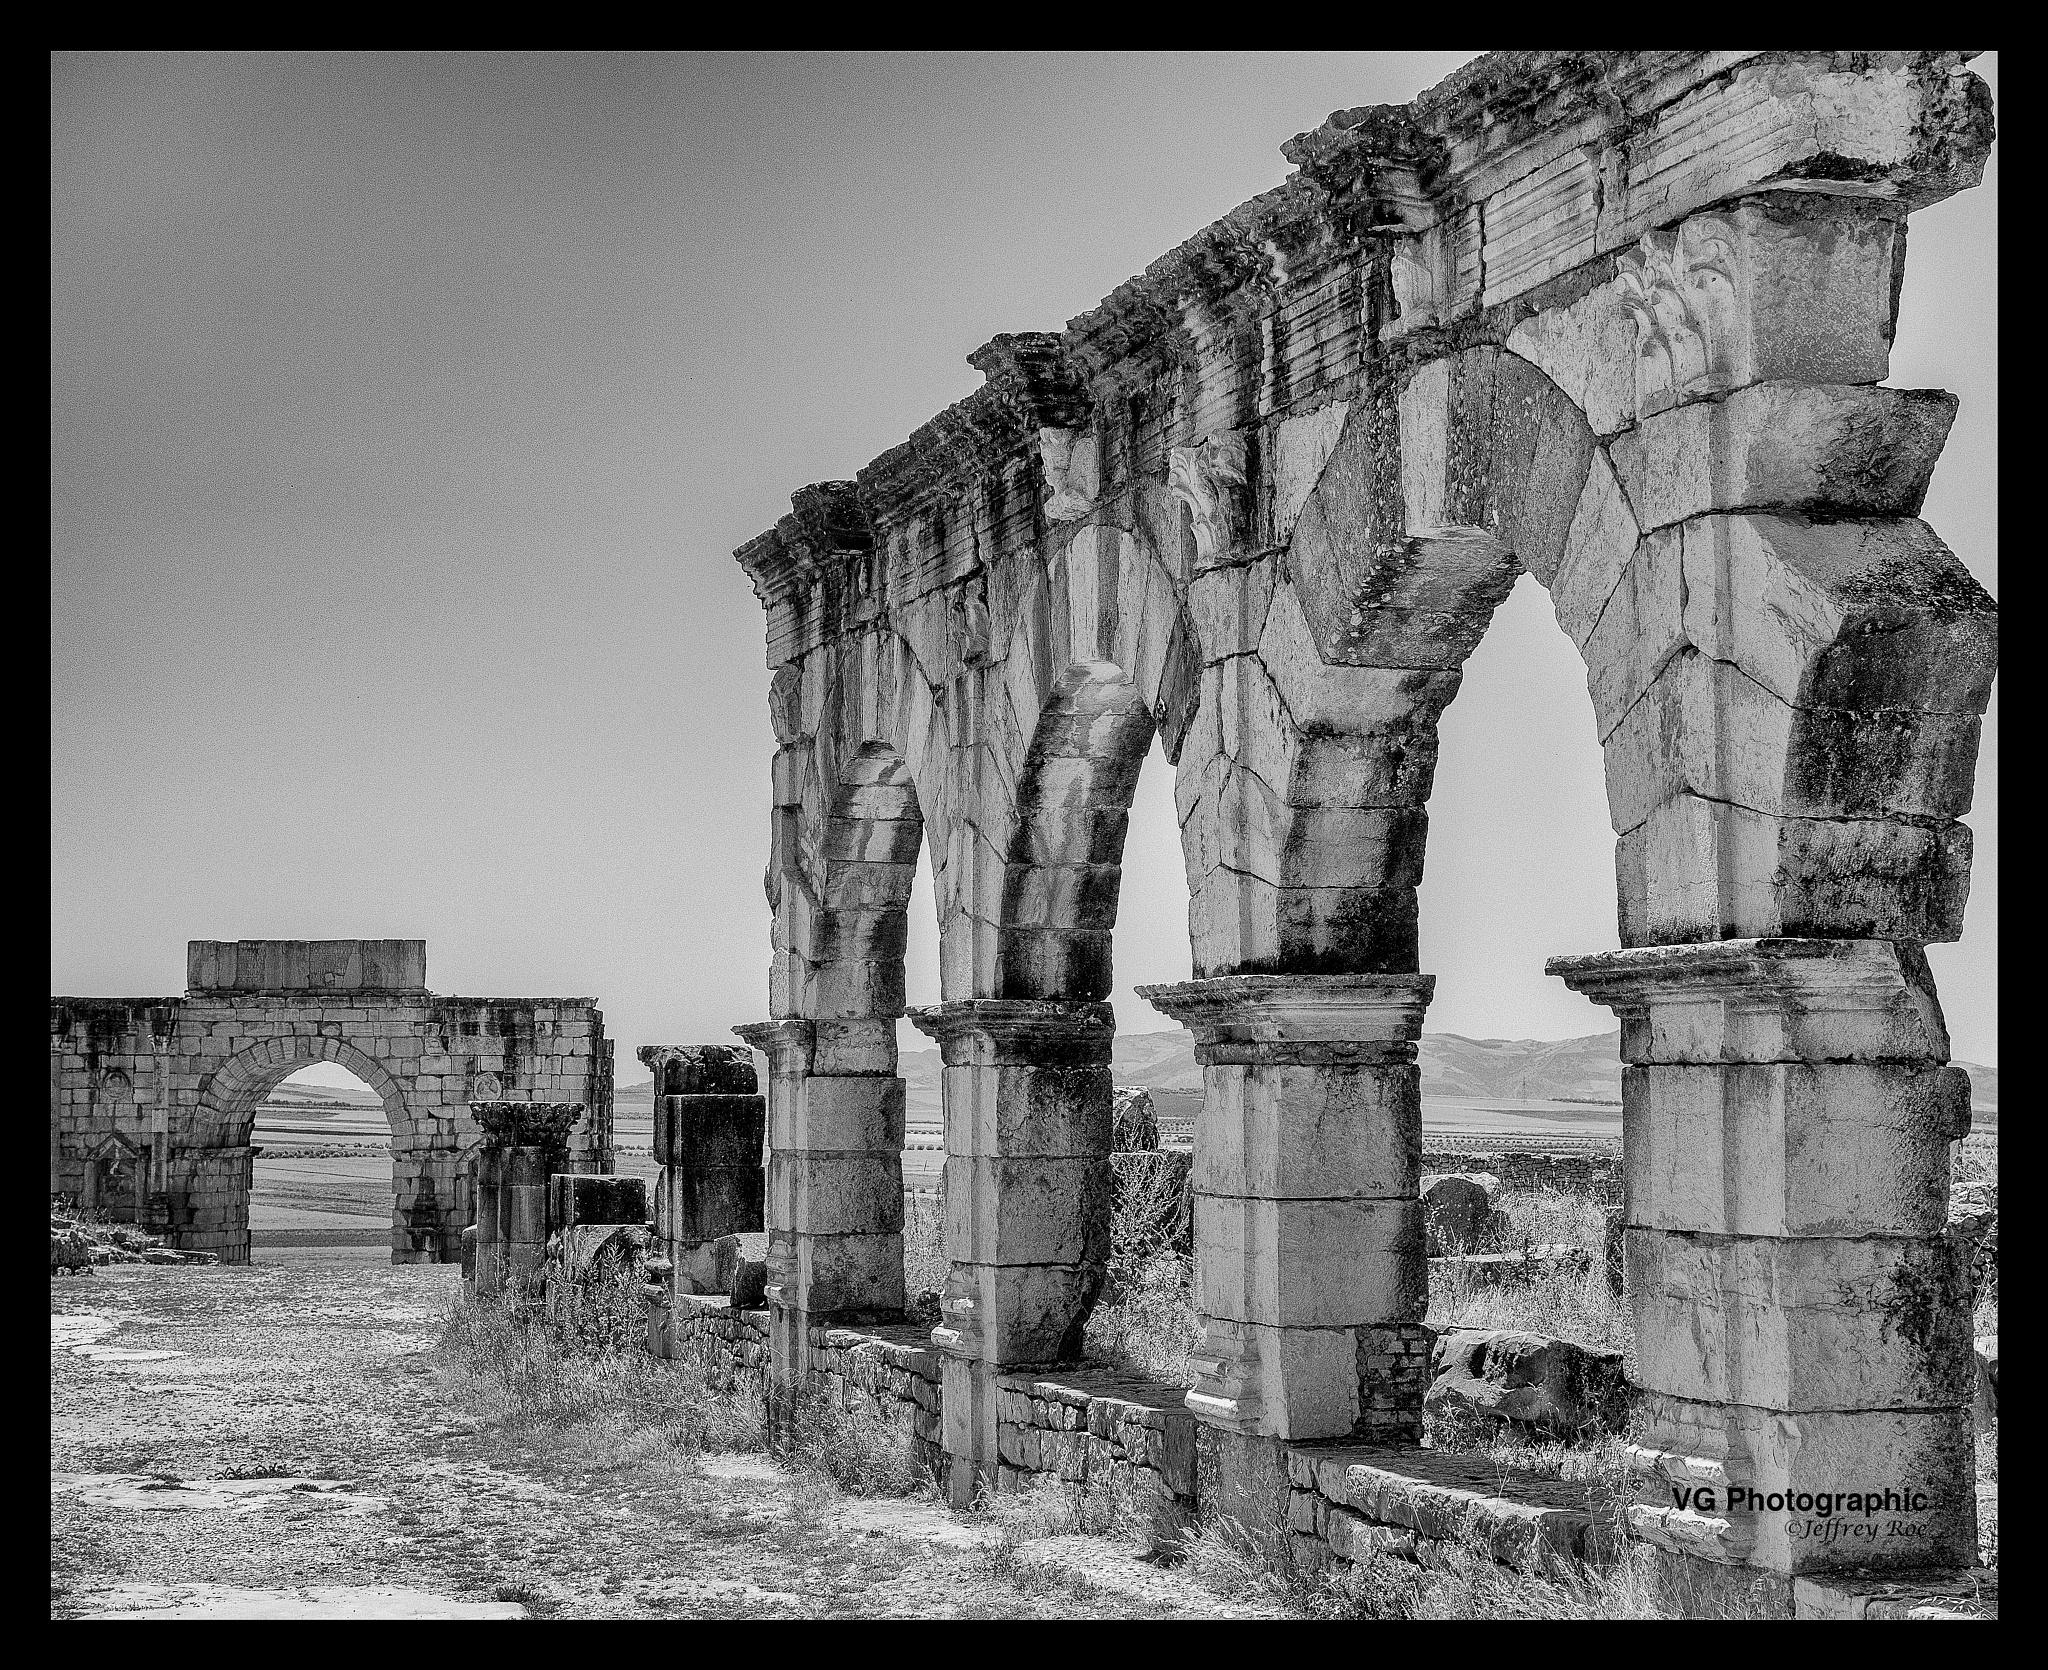 Roman Ruins of Volubilis by Jeffrey Roe